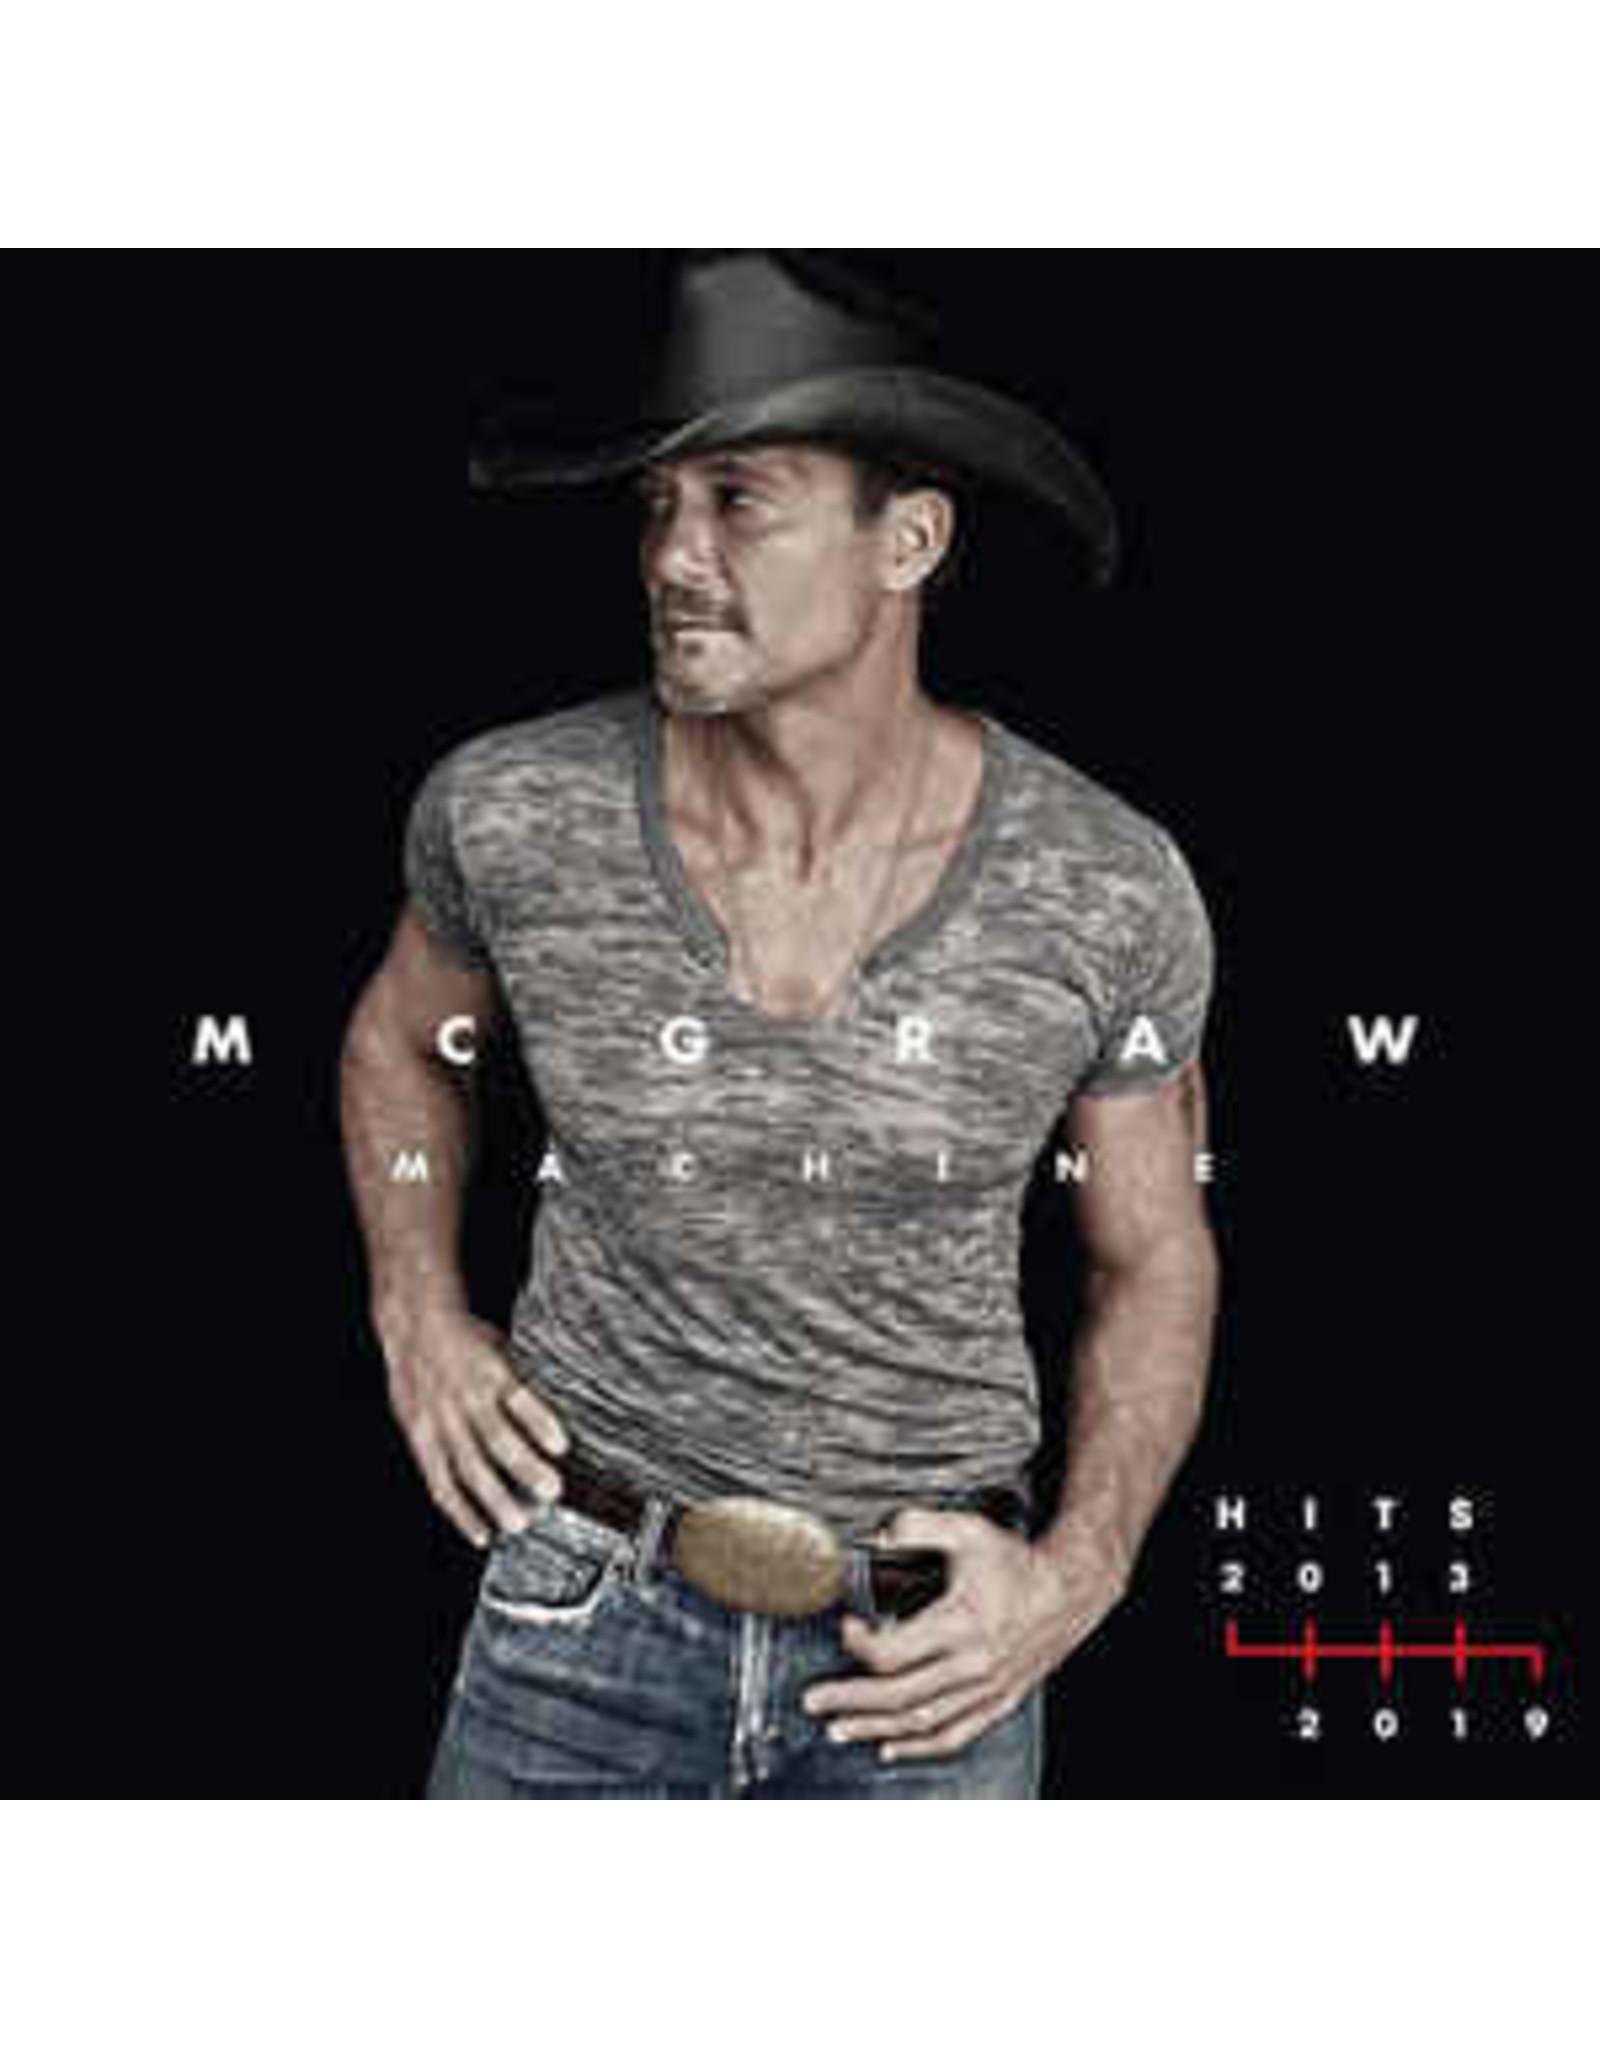 McGraw, Tim - Machine Hits 2013 - 2019 LP